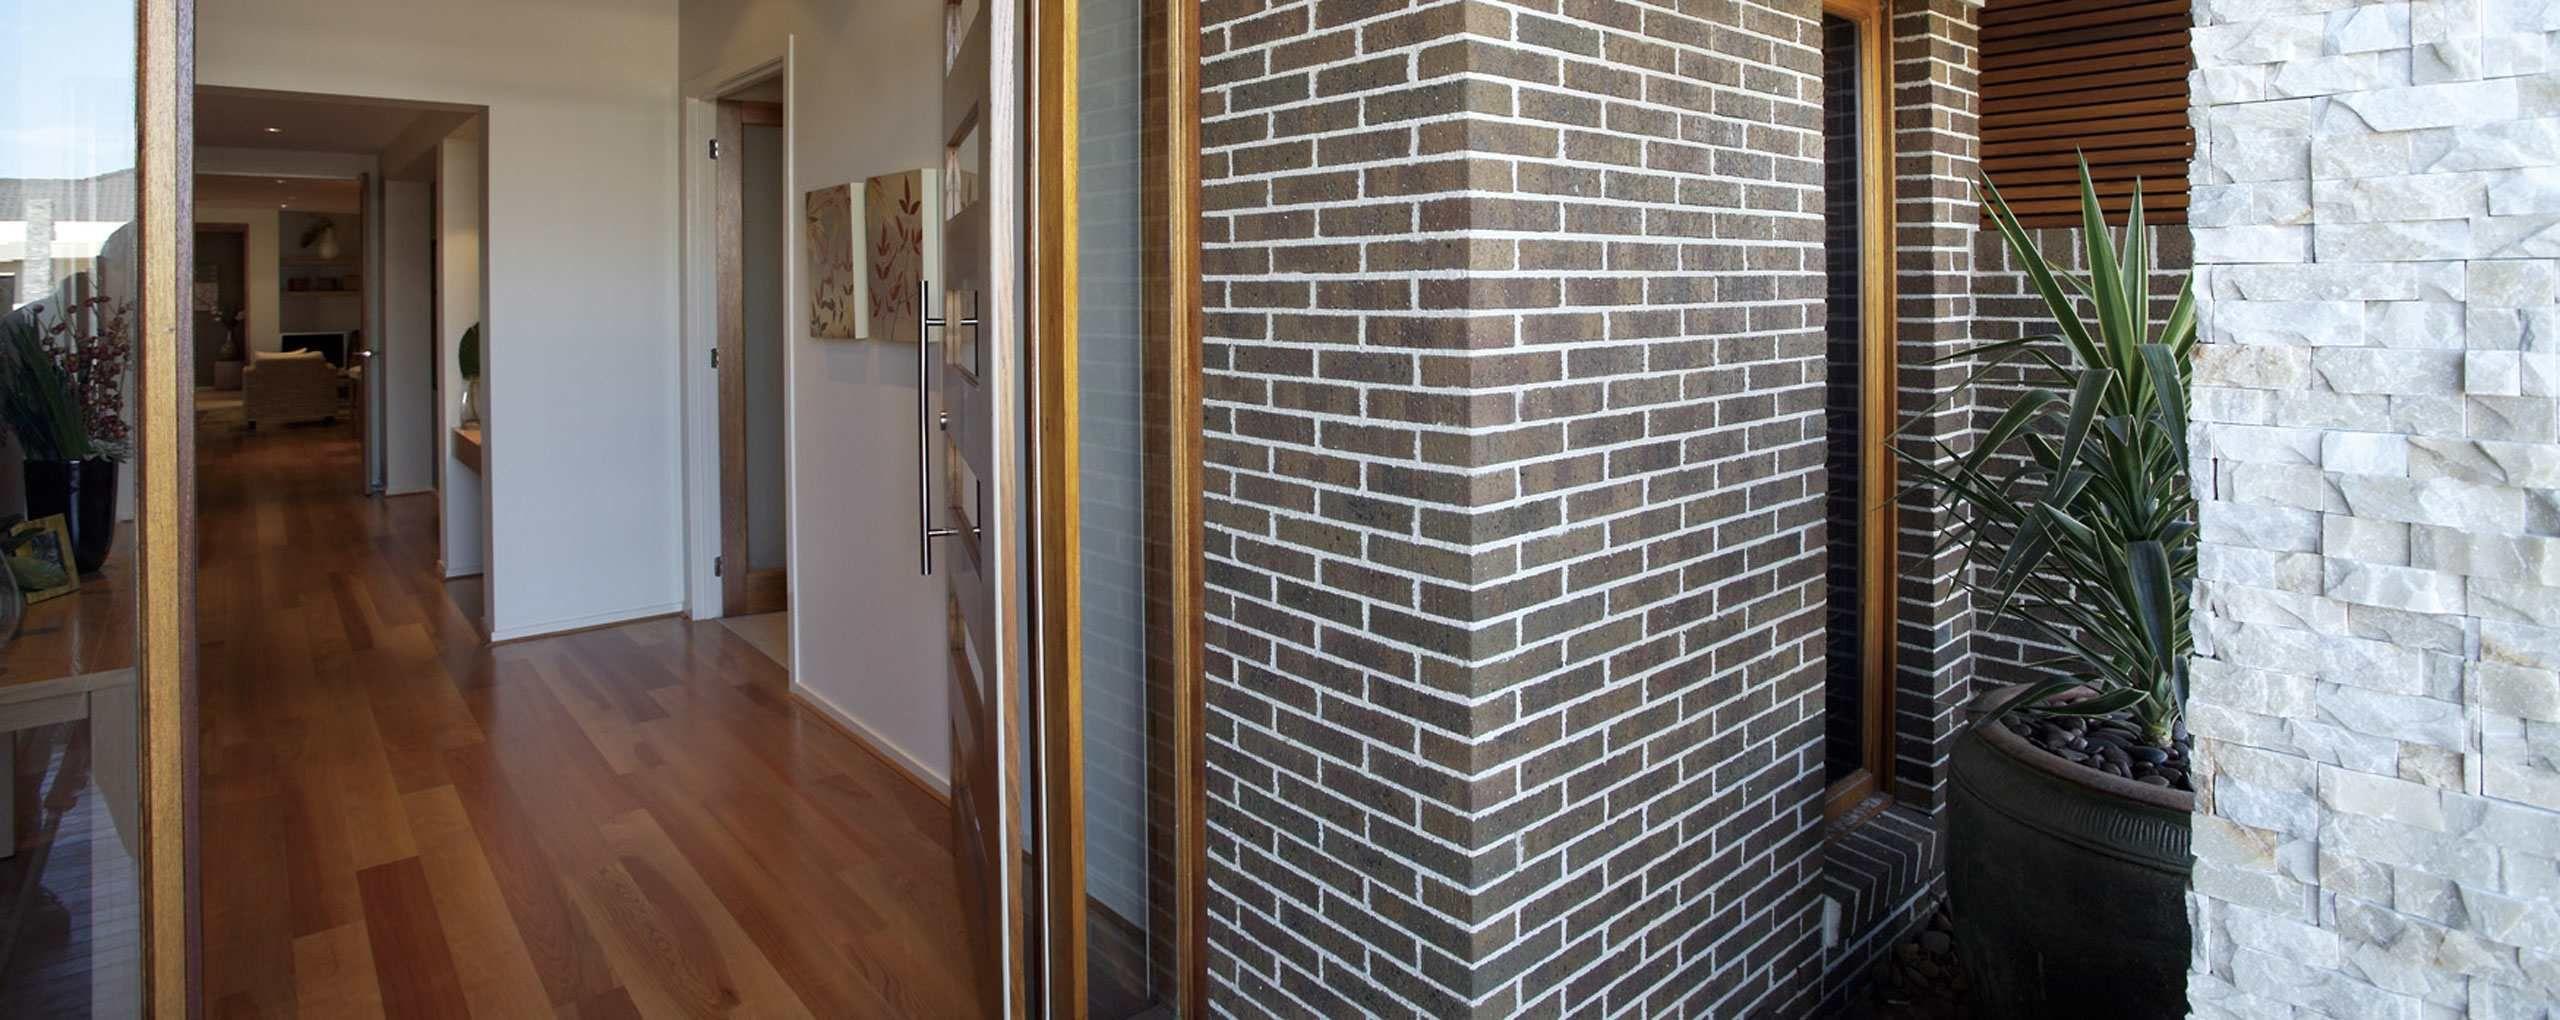 Austral Brick Melbourne Series Hawksburn Facade House